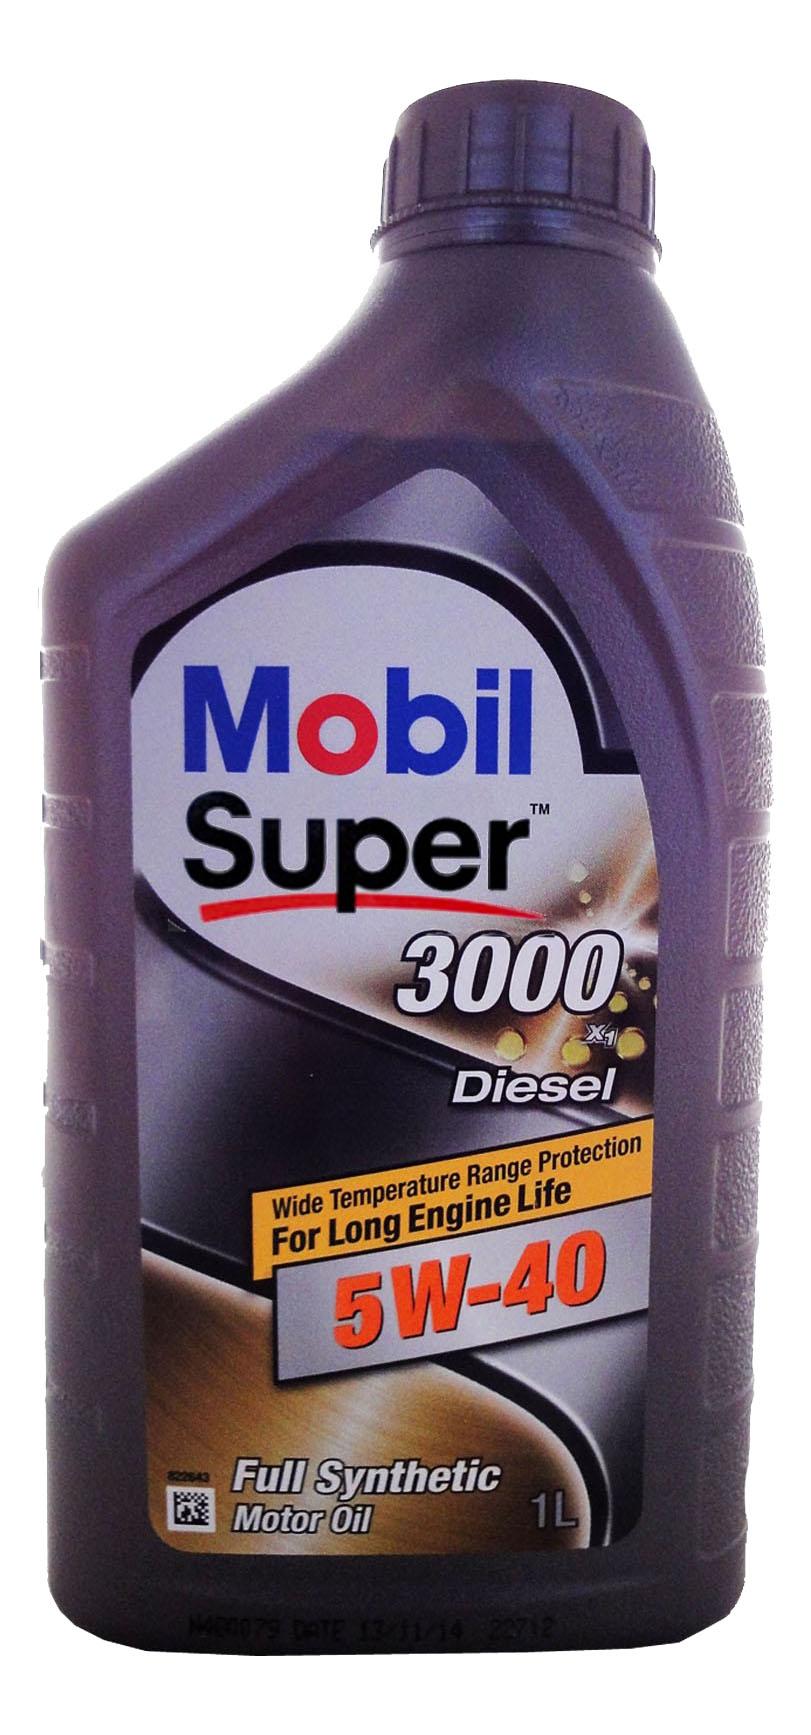 MOBIL SUPER 3000 X1 DIESEL